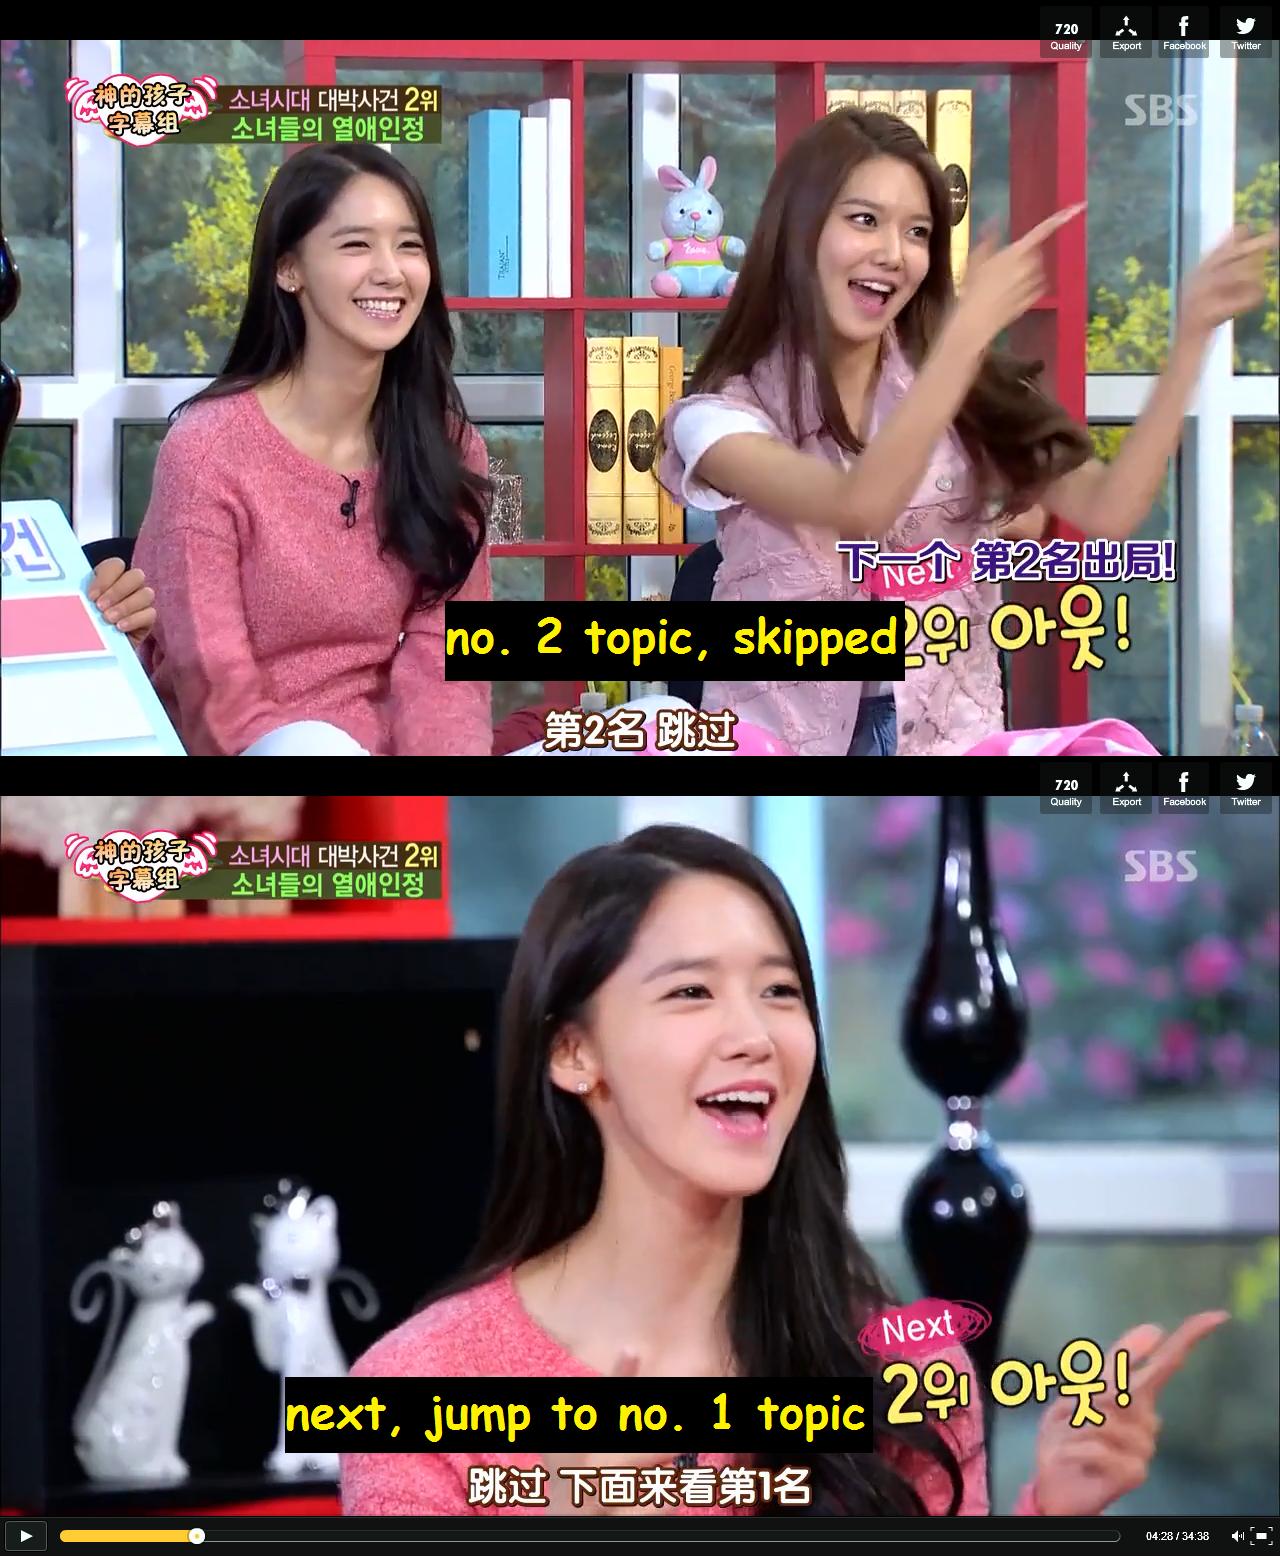 lee seung gi and yoona dating eng sub Yoona wallpapers kpop is an  lee jong suk wallpaper- lee seung gi wallpaper- hyun bin wallpaper- lee joon gi wallpaper- boa  english (united states.